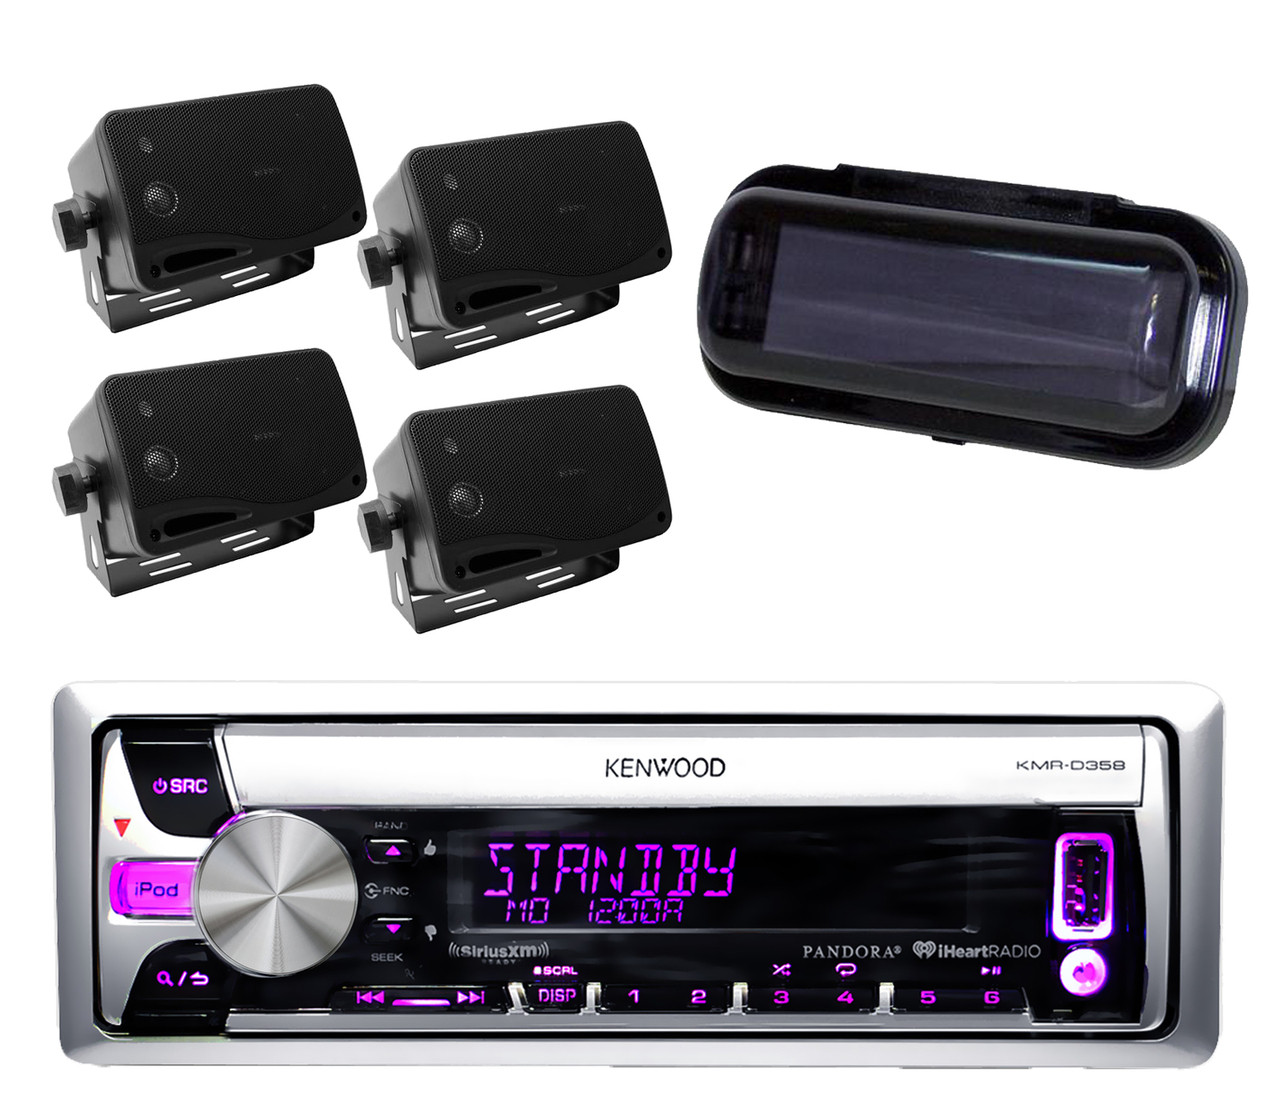 medium resolution of kenwood new kmr d358 iphone ipod pandora radio player 4 black box speakers